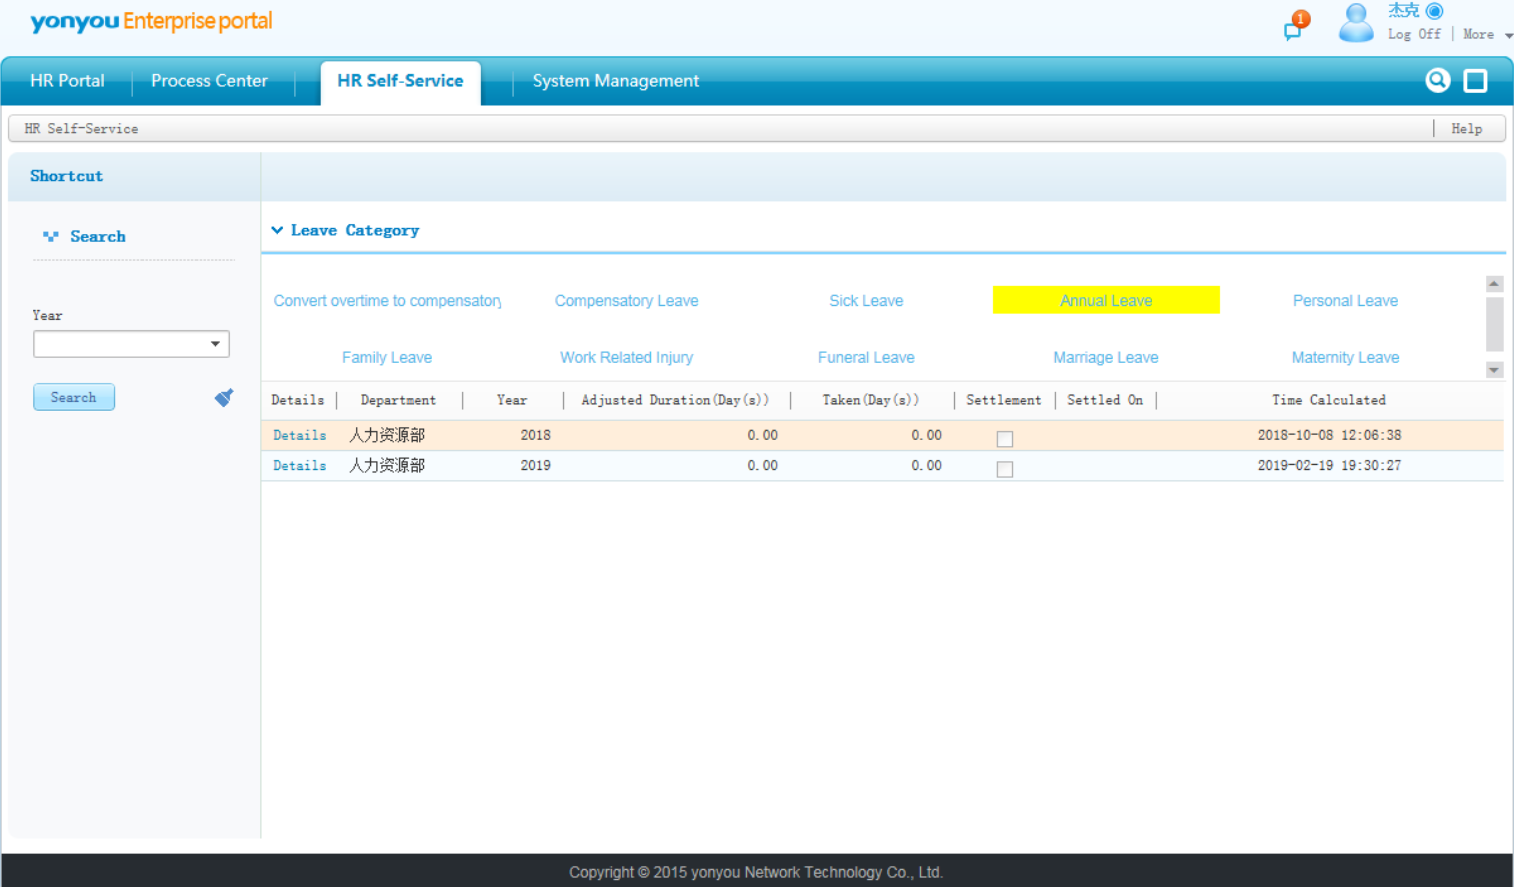 Human Capital Management | yonyou (Singapore) Pte Ltd